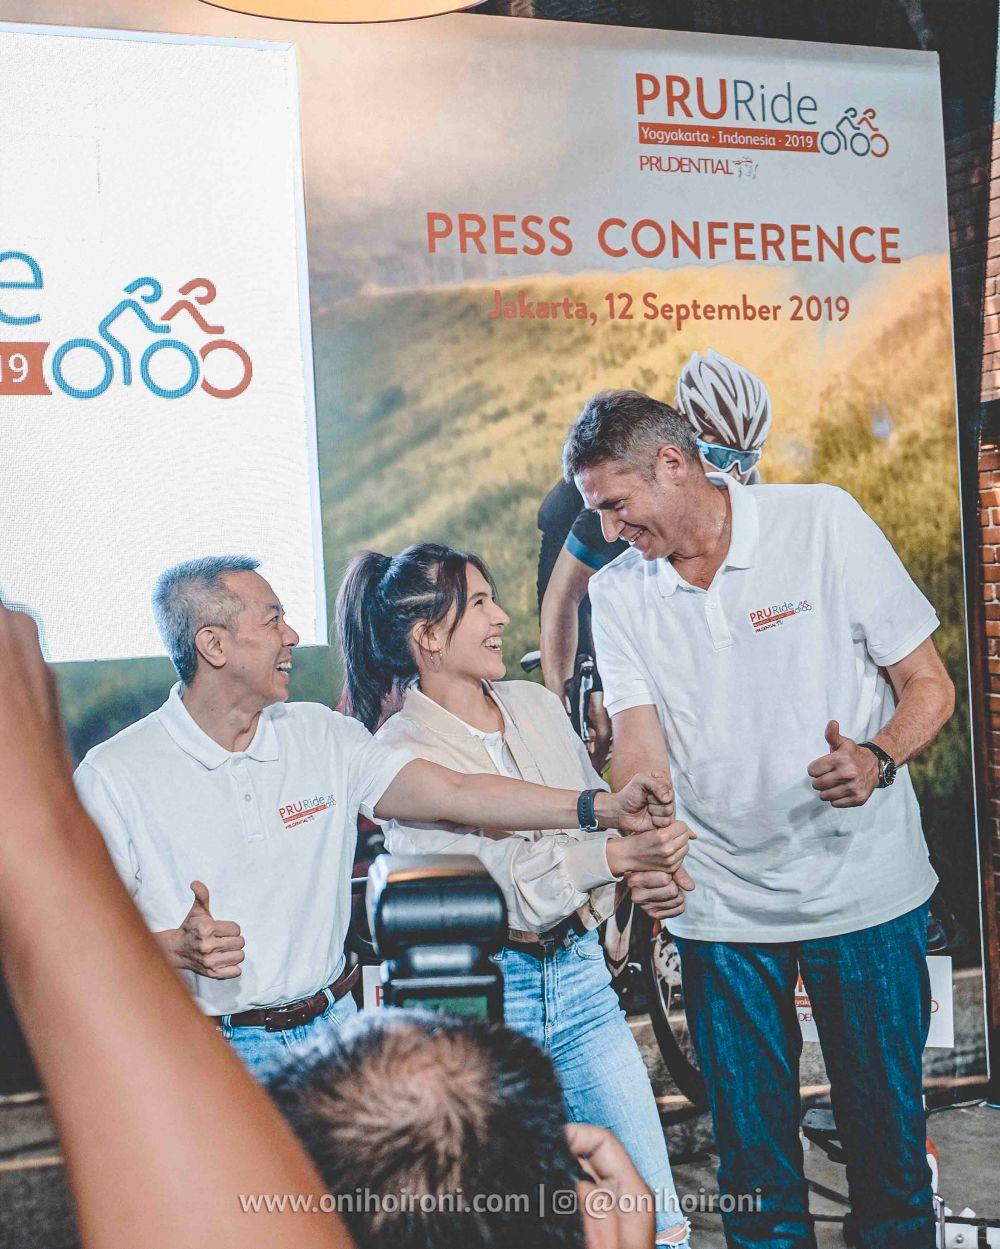 1 Pruride 2019 sport festival yogyakarta prudential indonesia oni hoironi.jpg